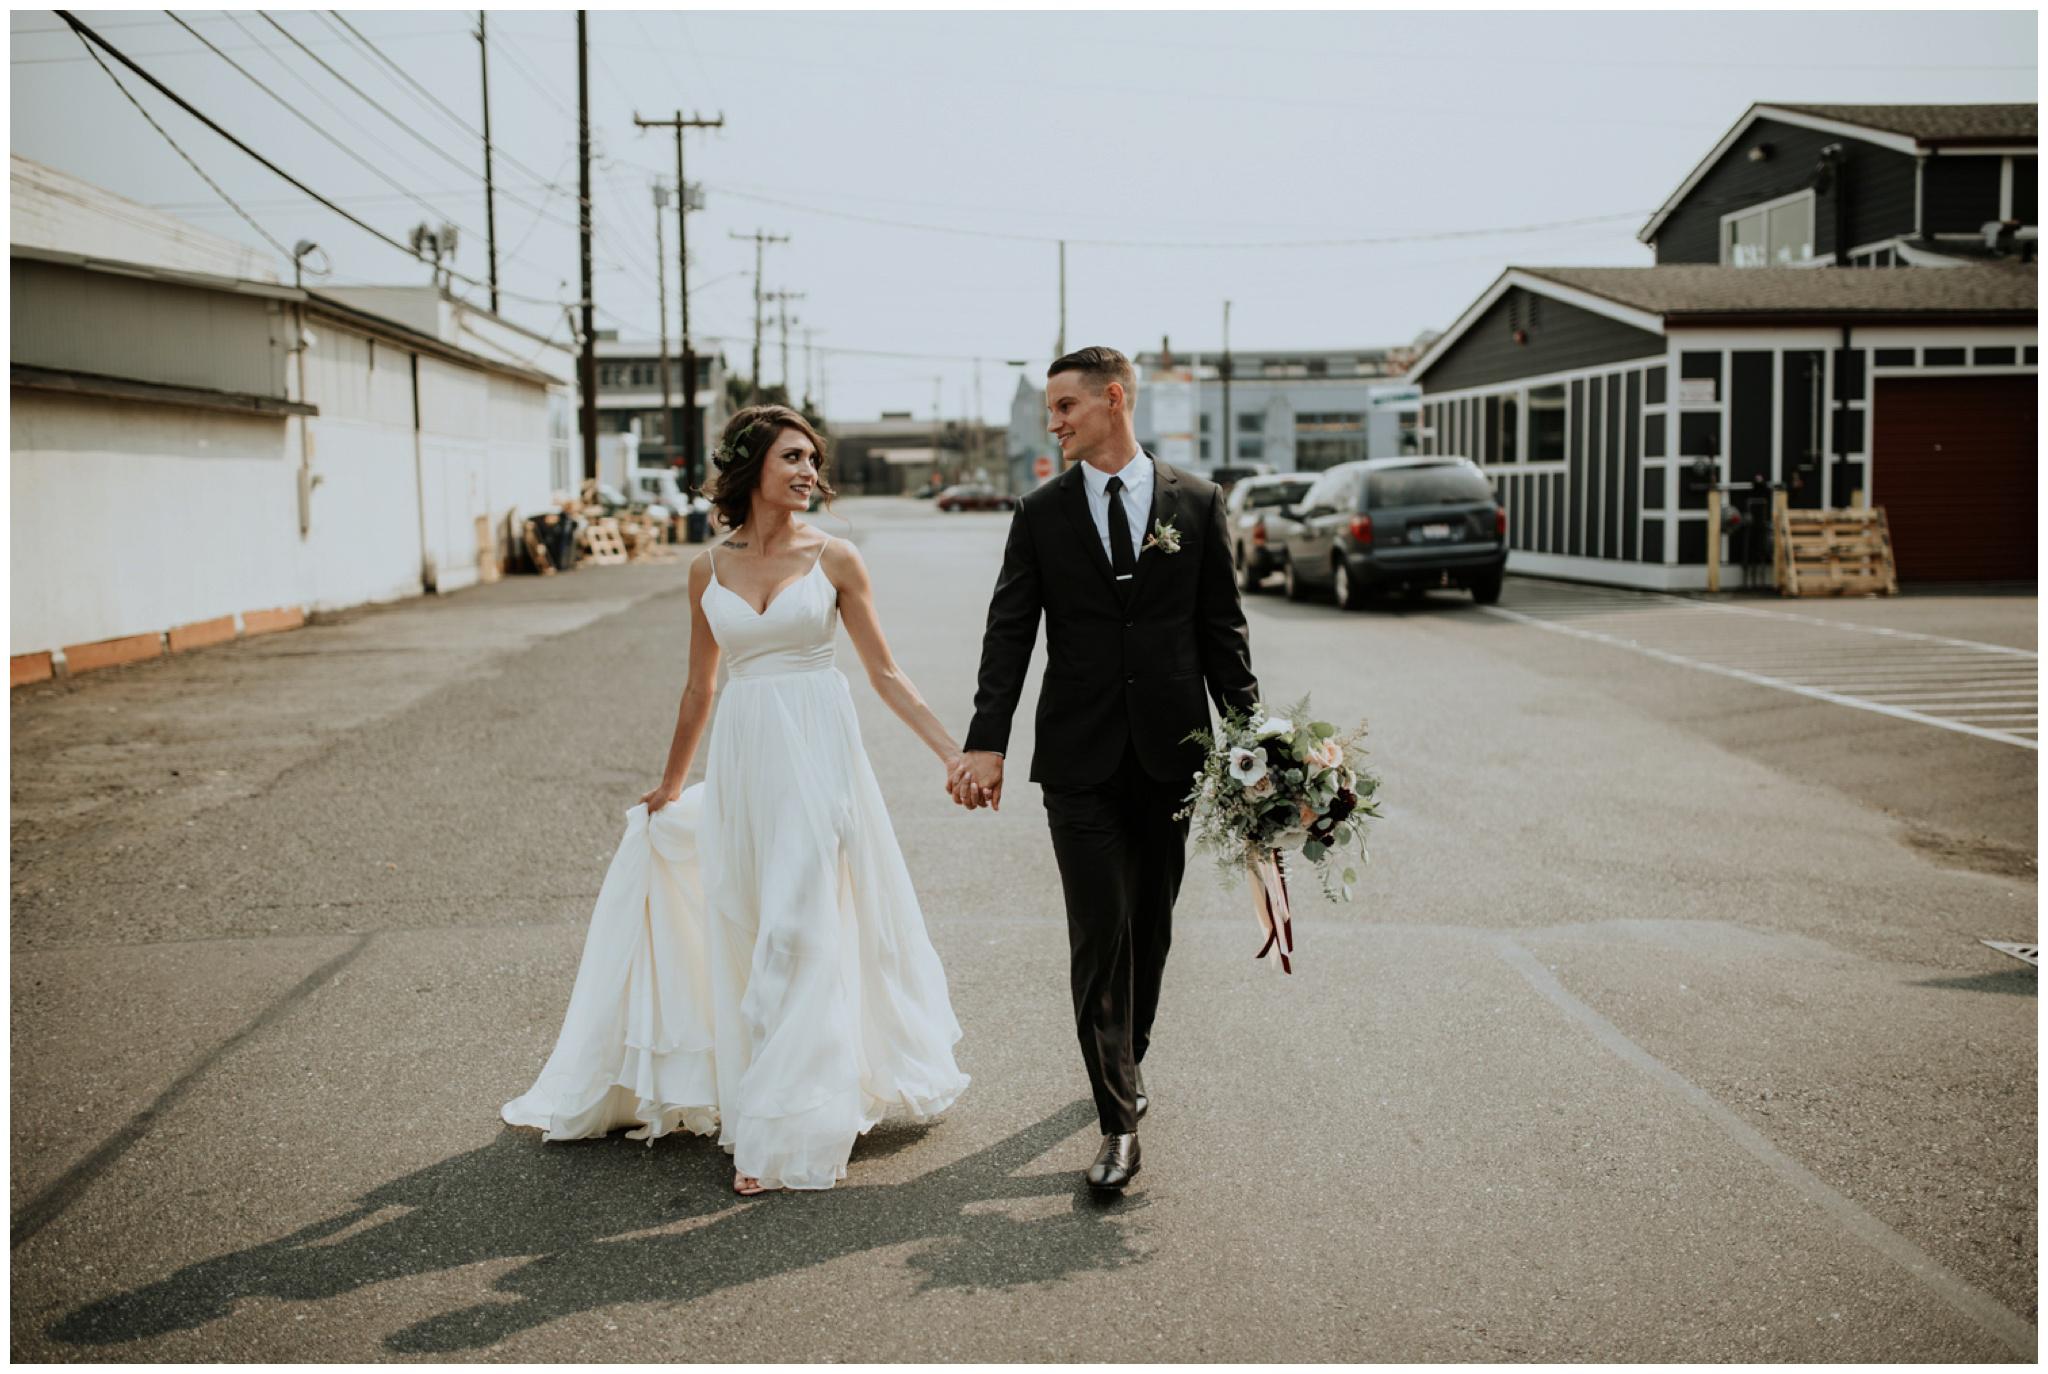 alyssa-keiran-westland-distillery-urban-seattle-wedding-photographer-caitlyn-nikula-73.jpg